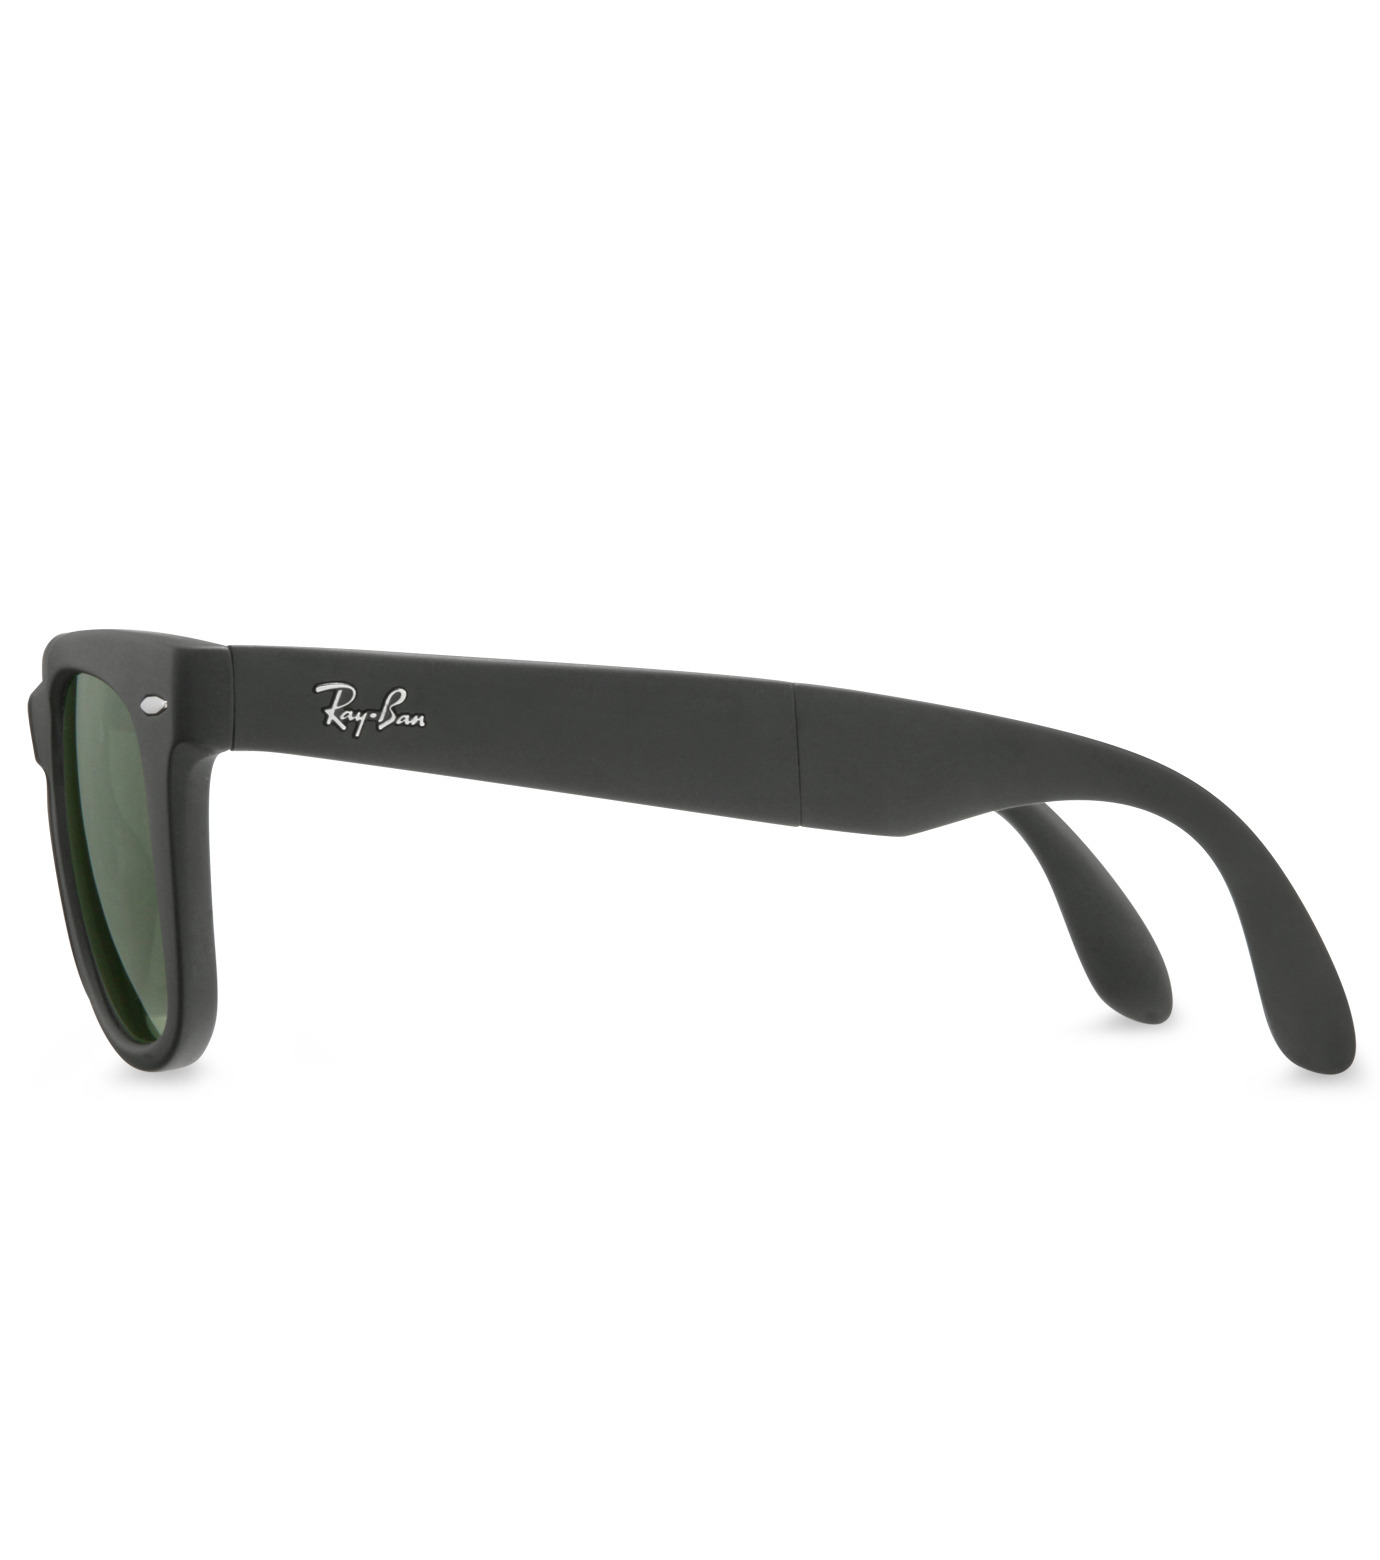 Ray-Ban(レイバン)のWayfarer Matte Black-CHARCHOL GRAY(アイウェア/eyewear)-BR-4105-12 拡大詳細画像2